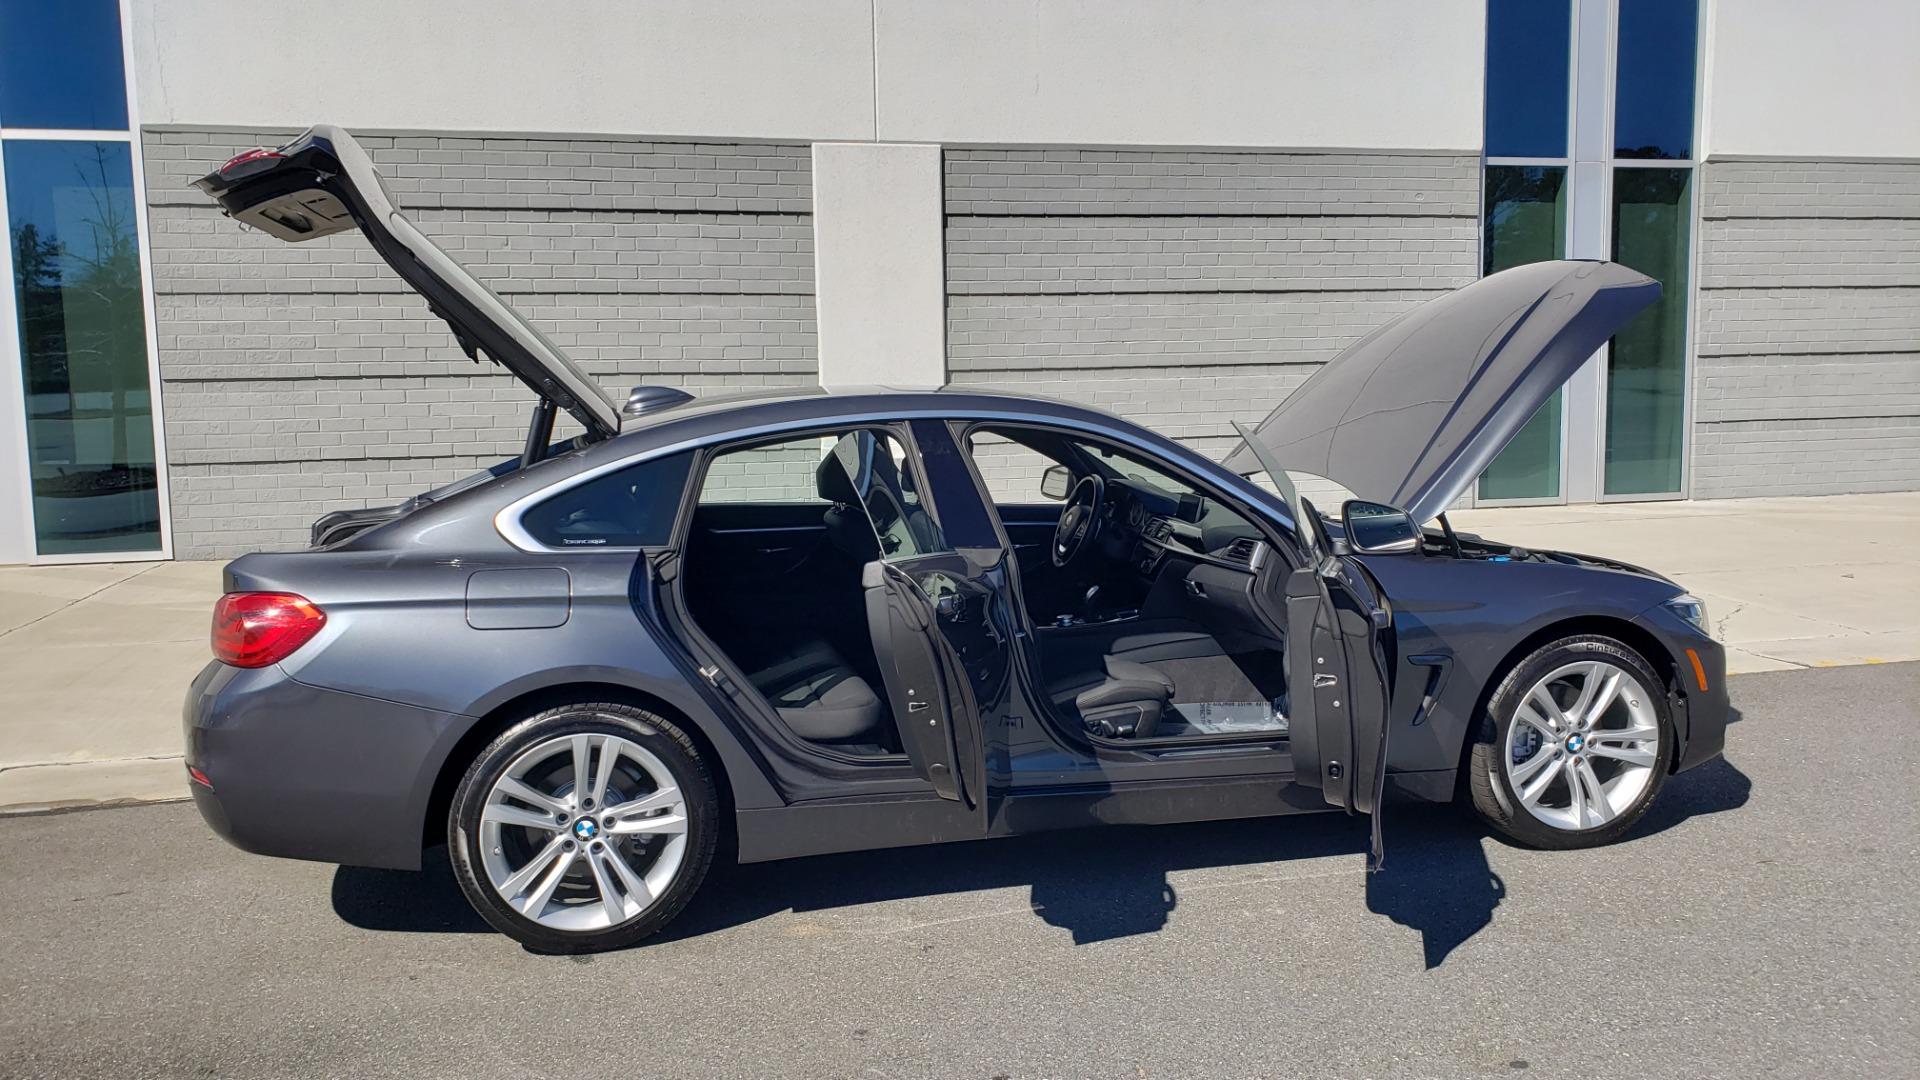 Used 2018 BMW 4 SERIES 430IXDRIVE / PREMIUM / NAV / SUNROOF / ESSENTIALS PKG for sale $29,495 at Formula Imports in Charlotte NC 28227 11